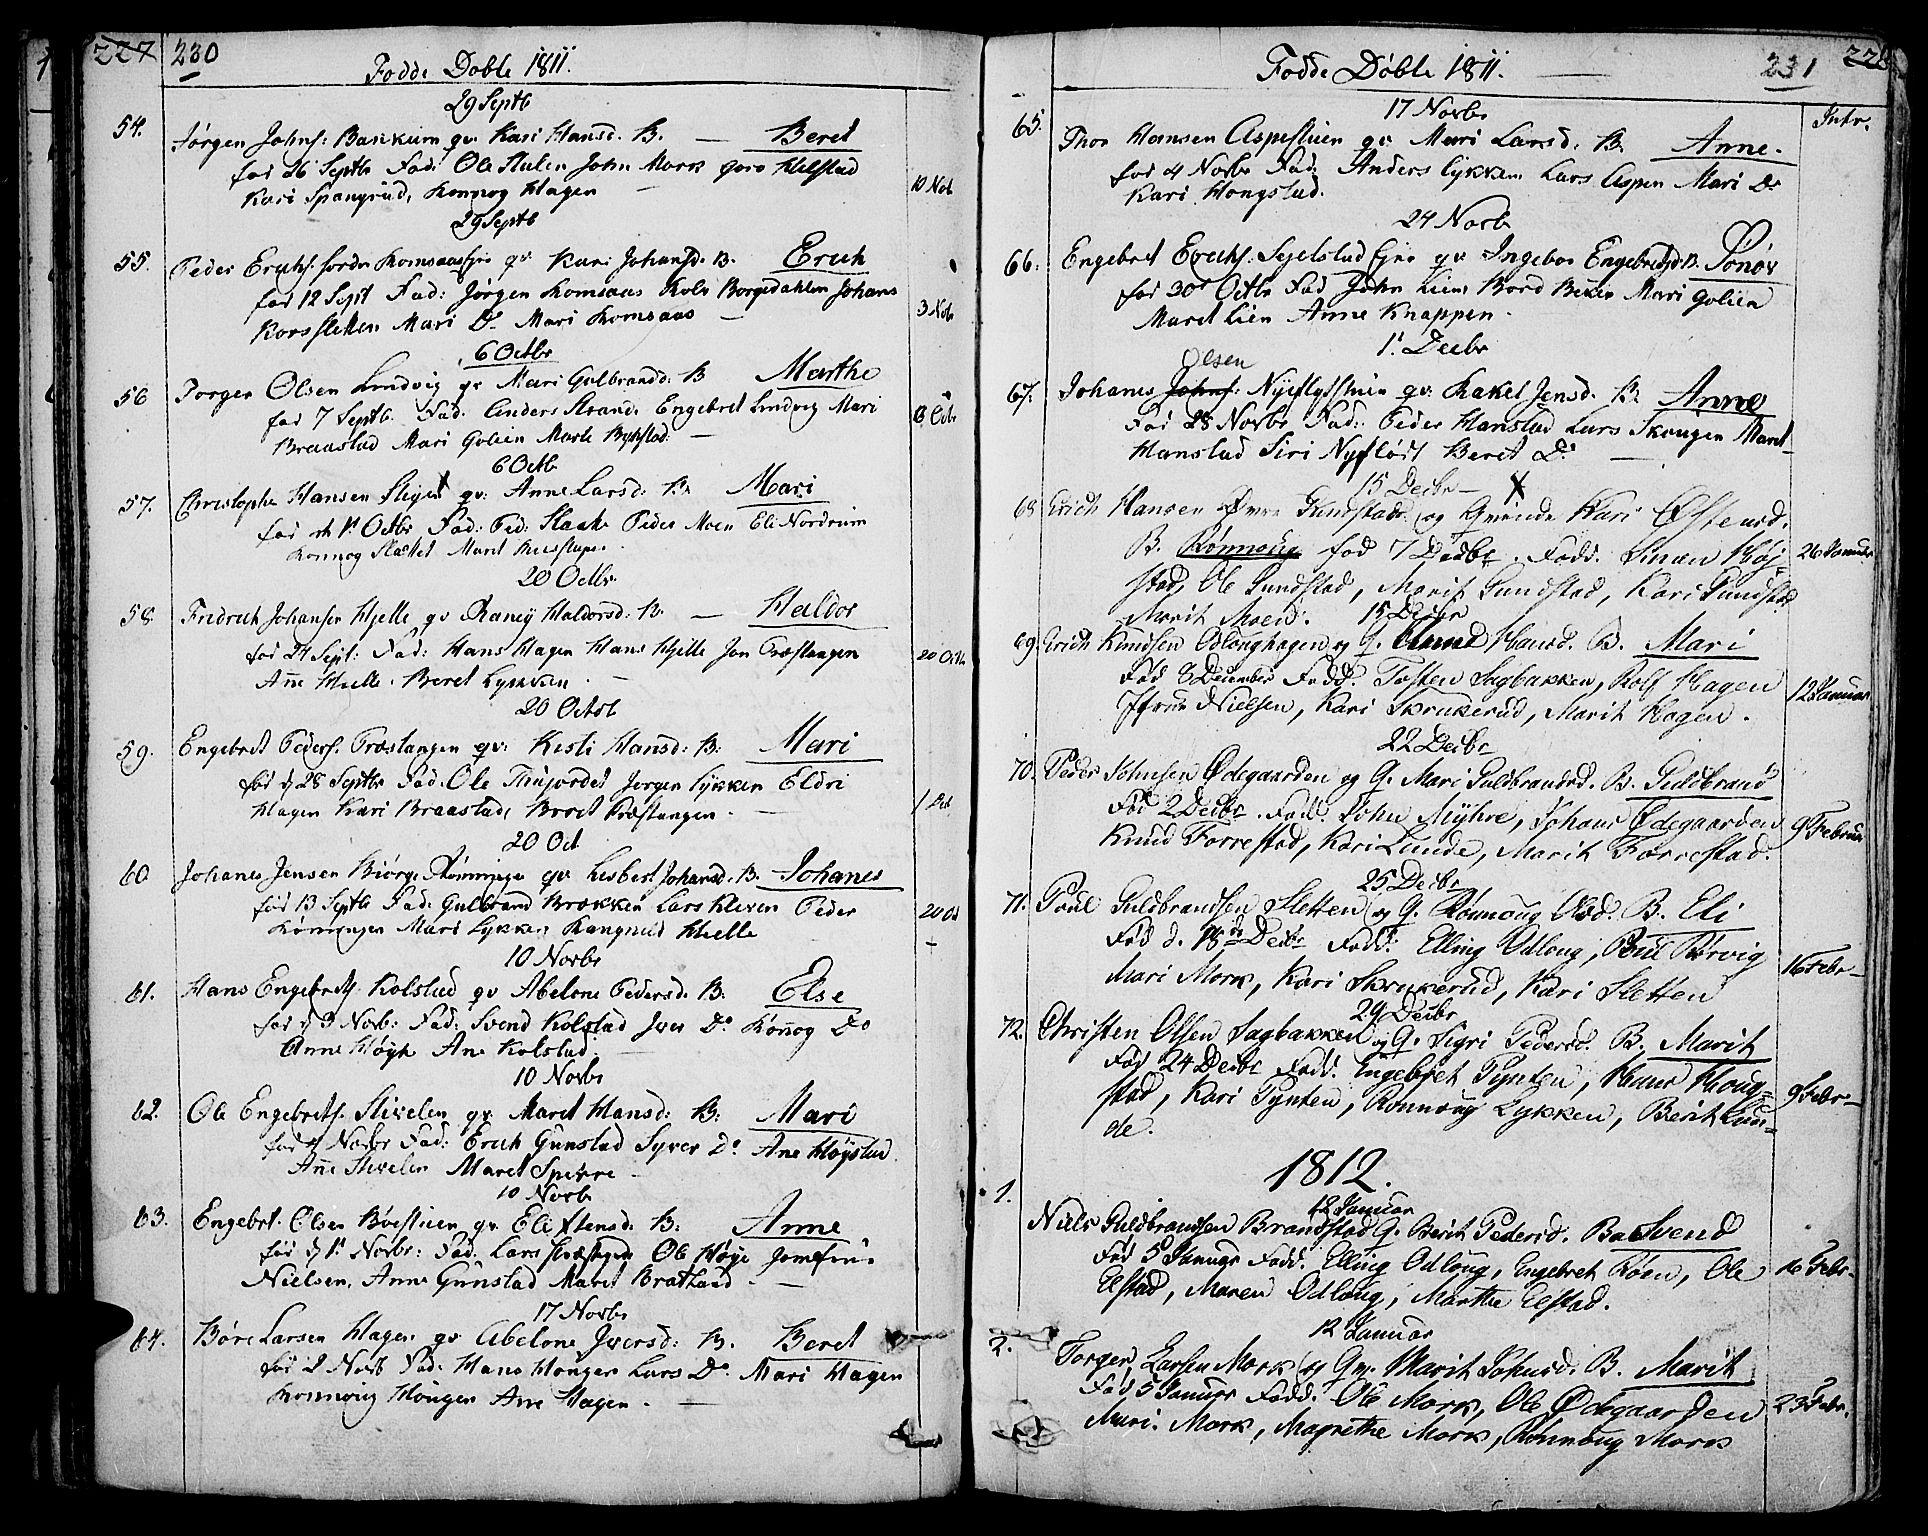 SAH, Ringebu prestekontor, Ministerialbok nr. 3, 1781-1820, s. 230-231